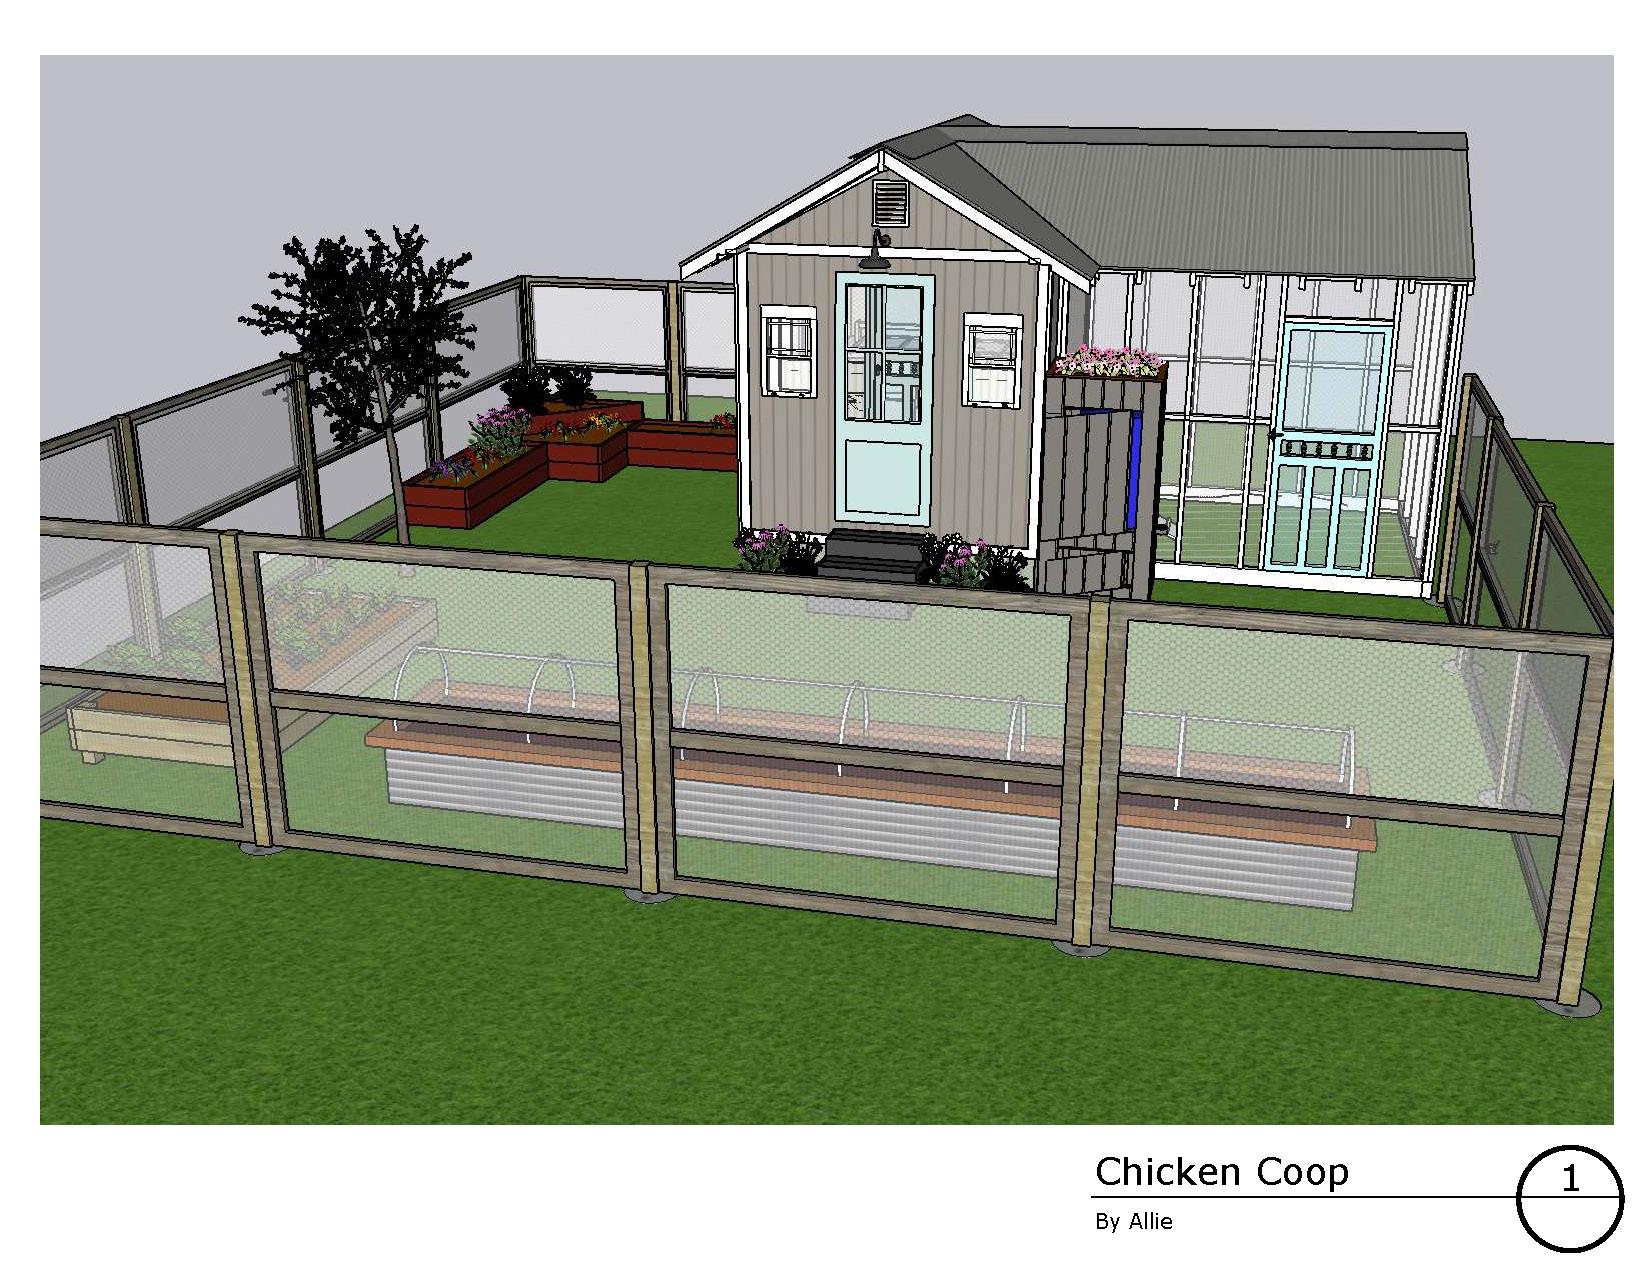 Chicken coop blueprints_Page_1.jpg